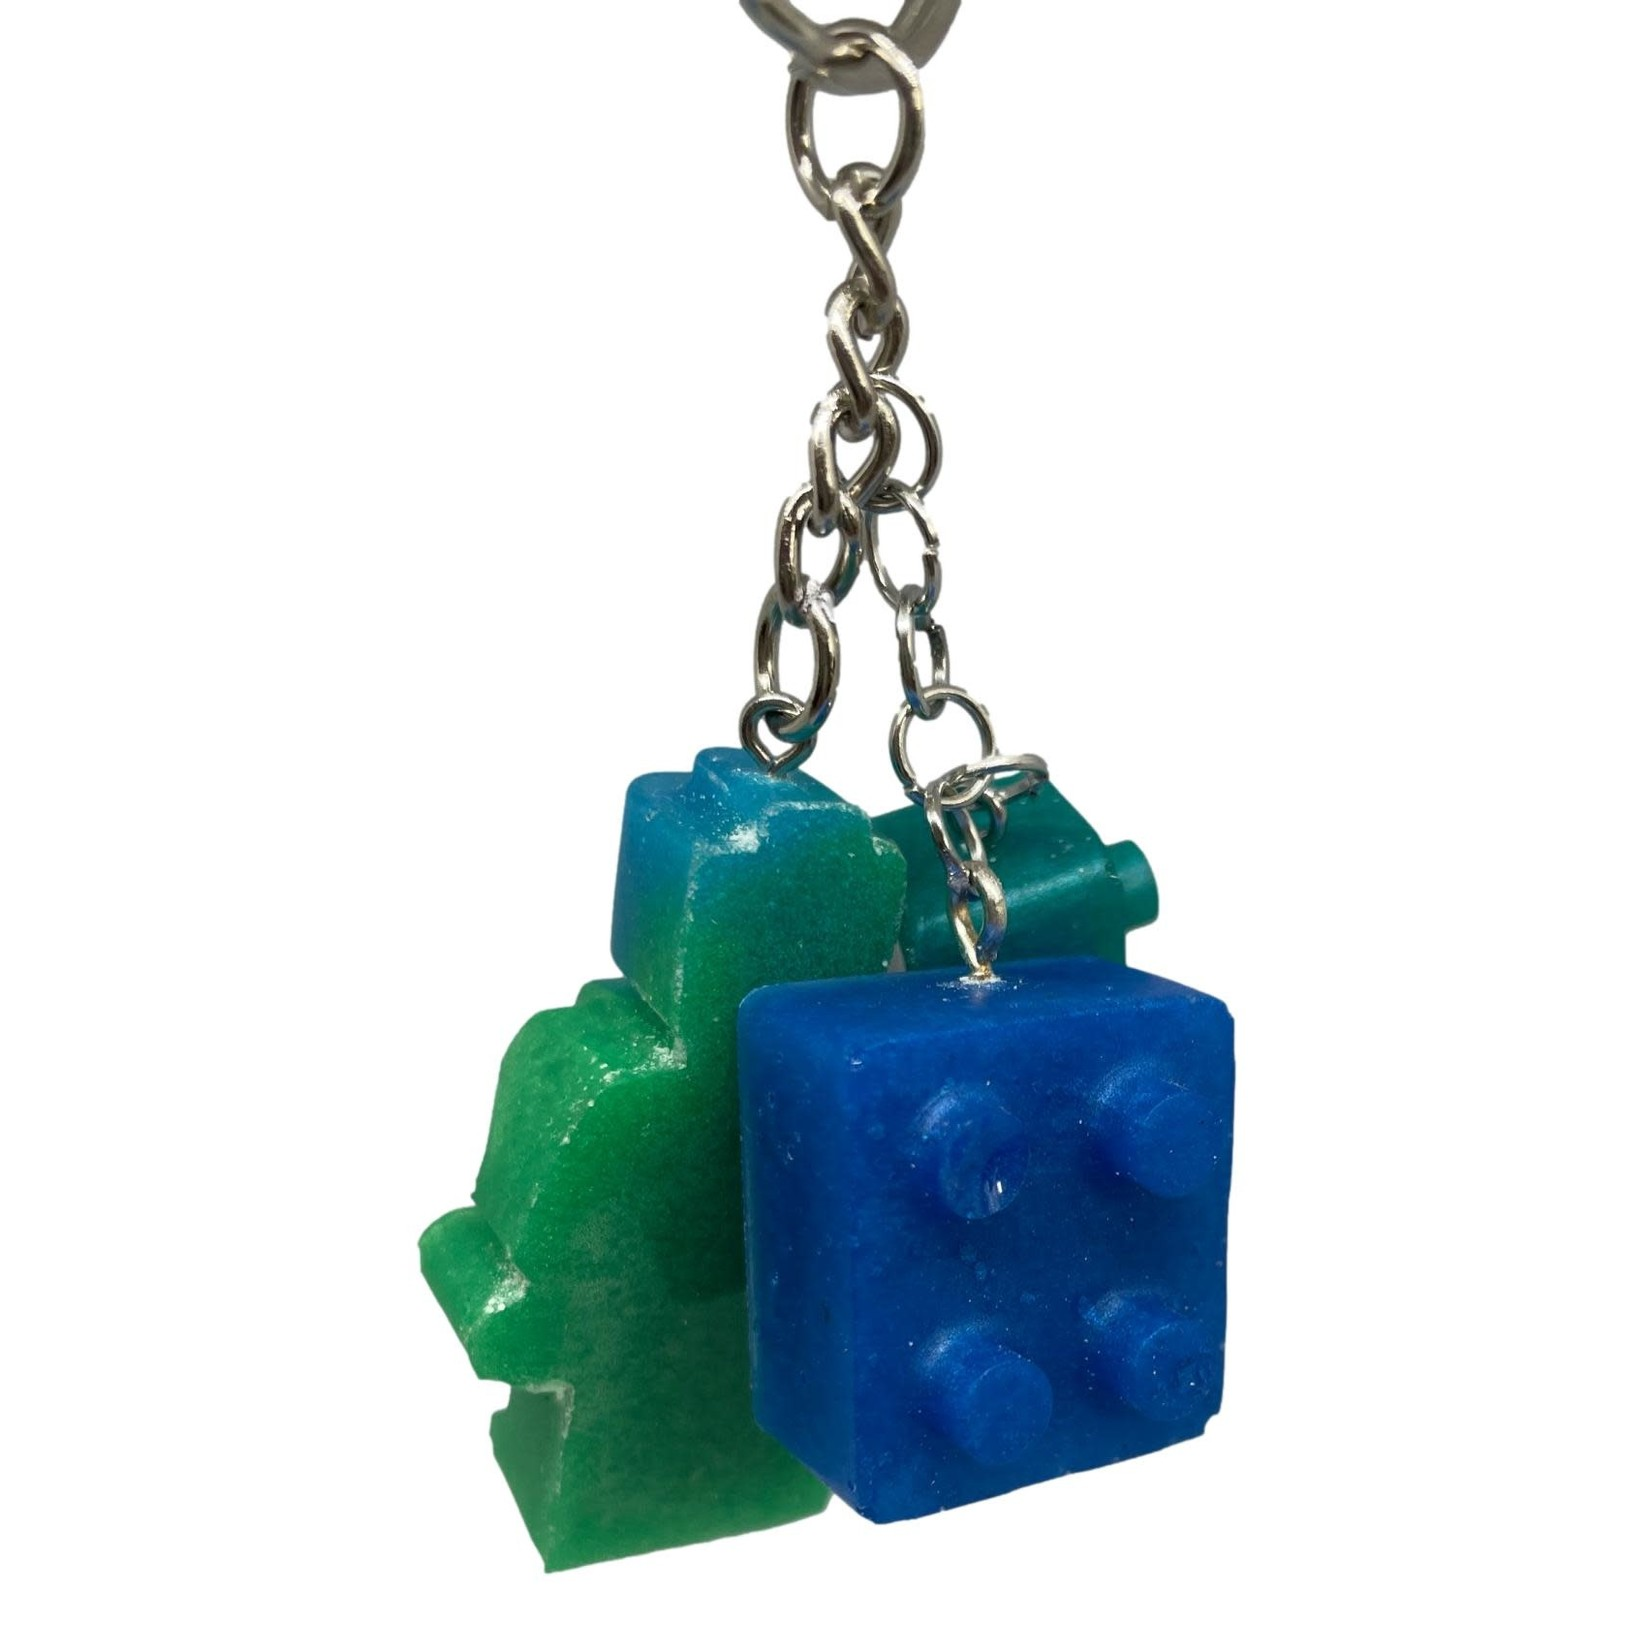 East Coast Sirens 3pc Lego Key Chain